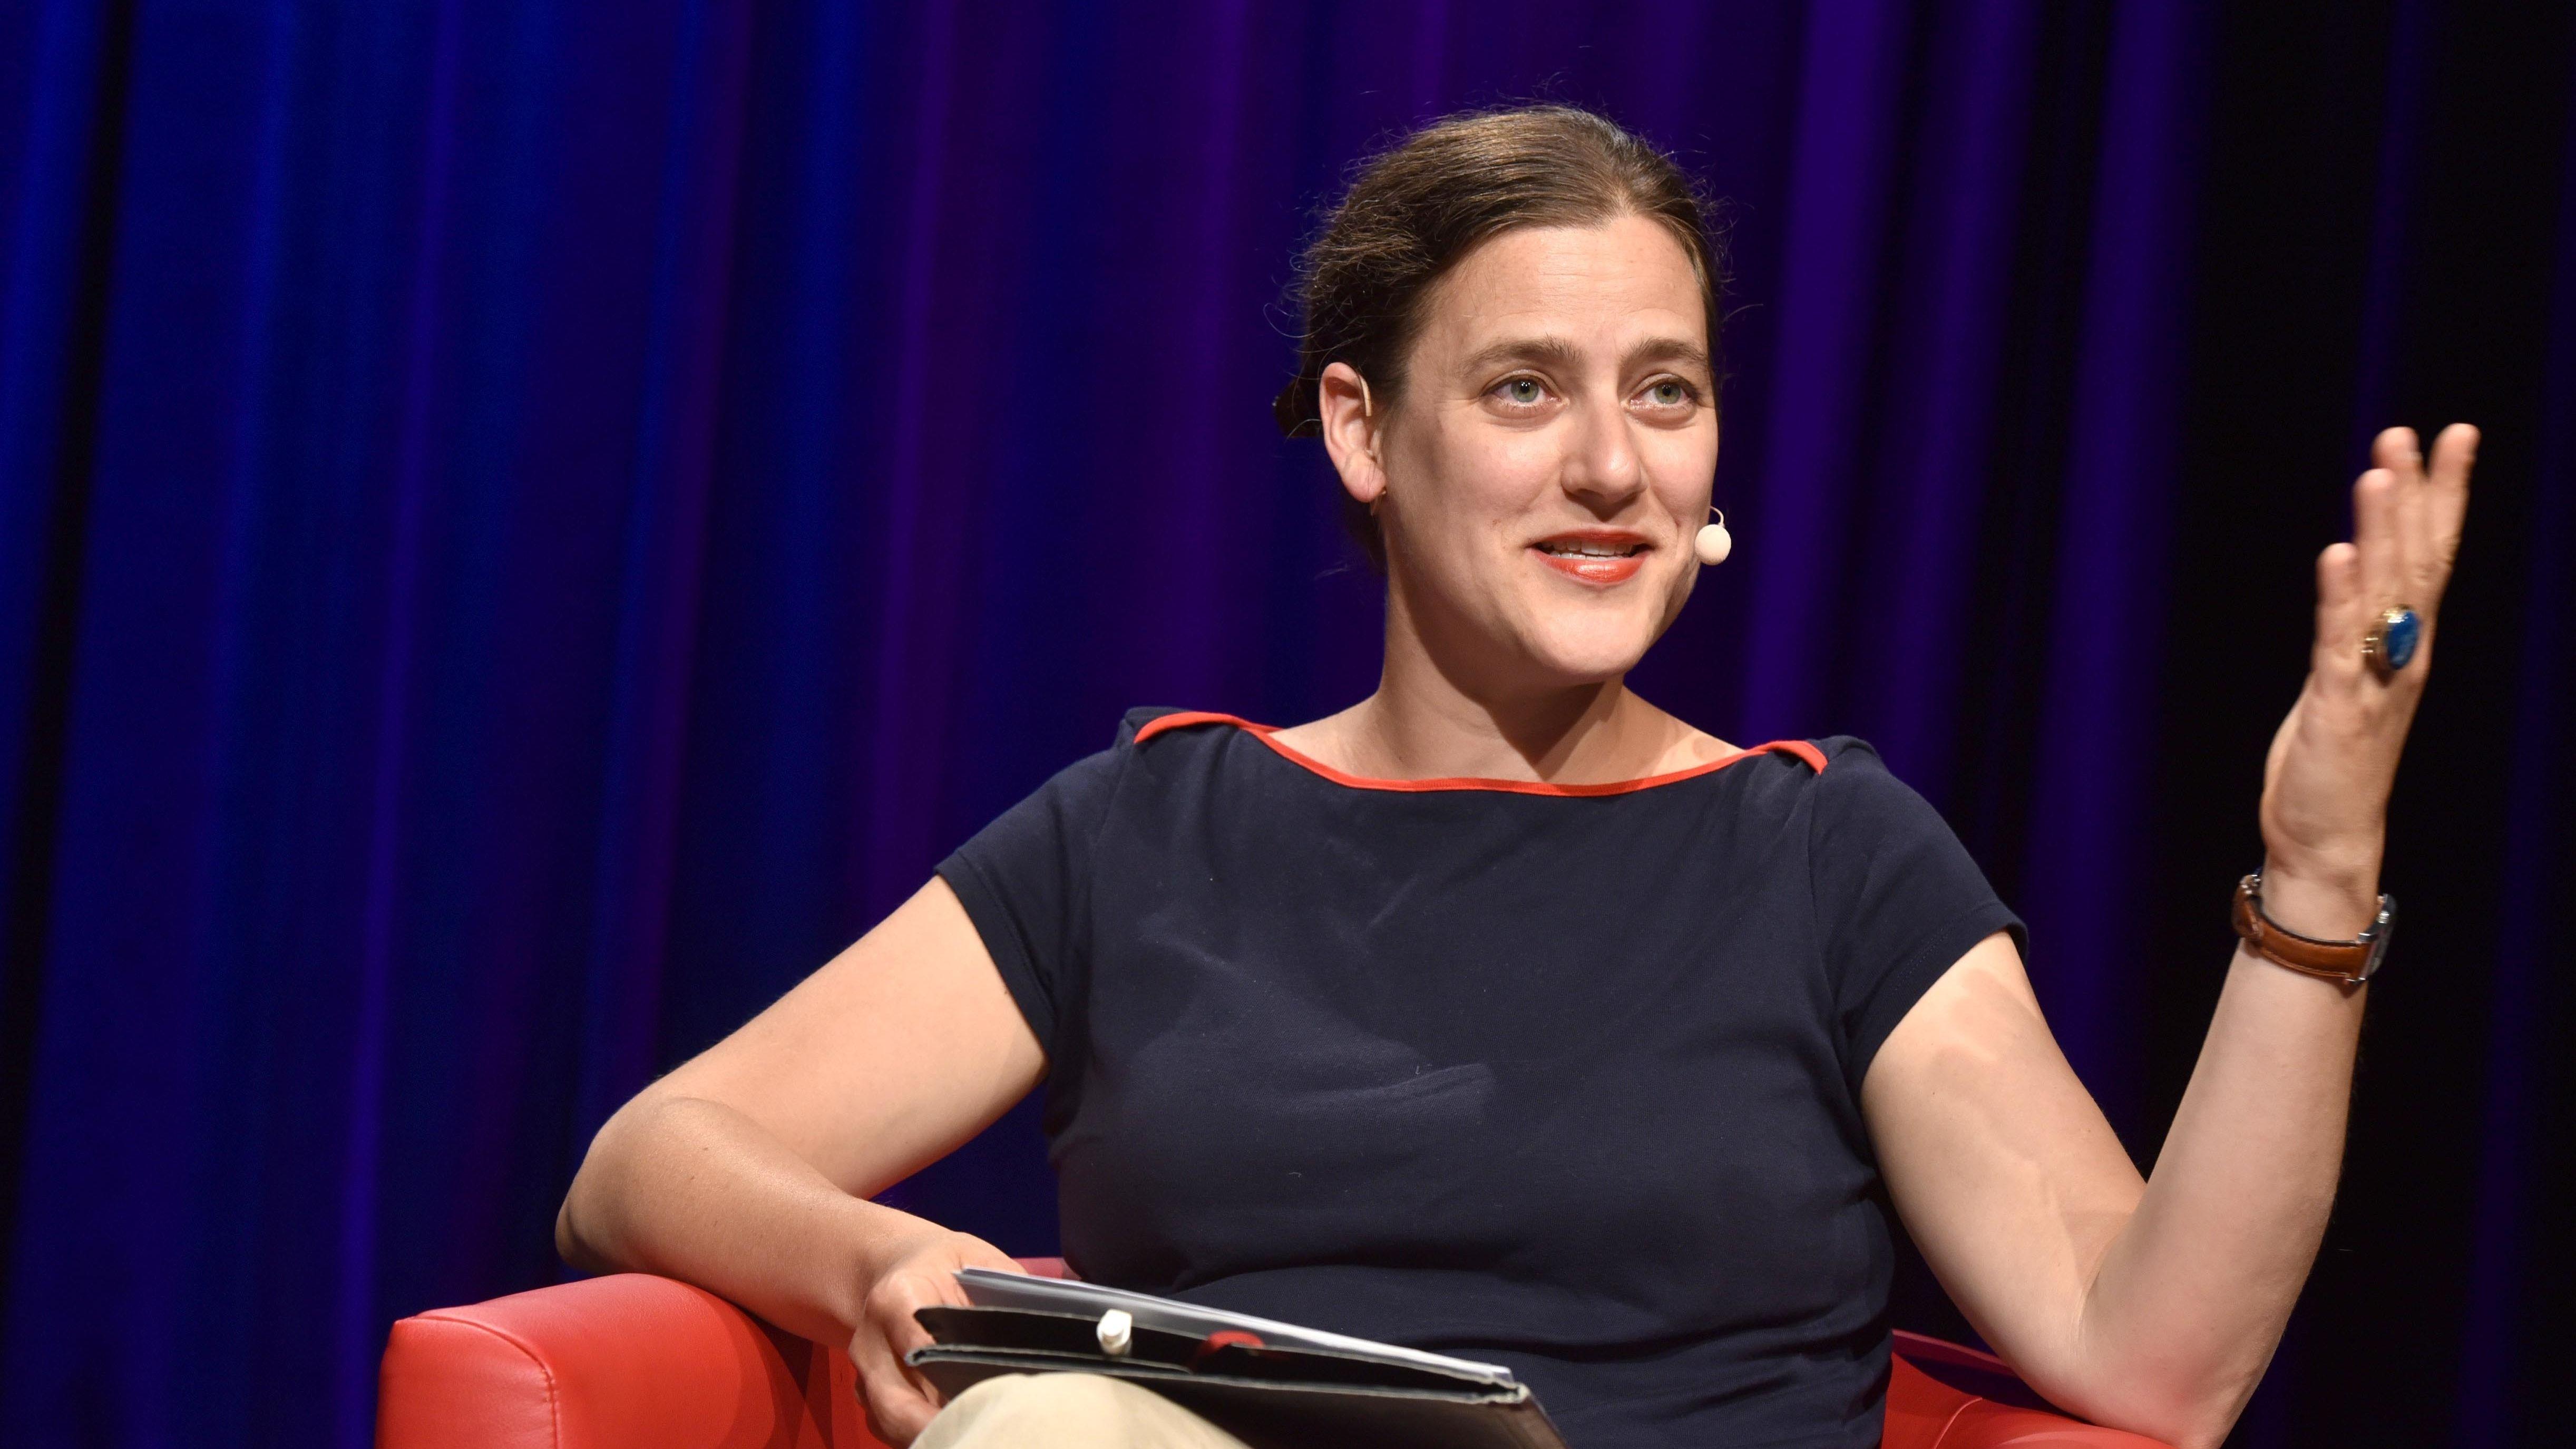 Frau in rotem Sessel, lächelnd gestikulierend: die Schweizer Philosophin Catherine Newmark